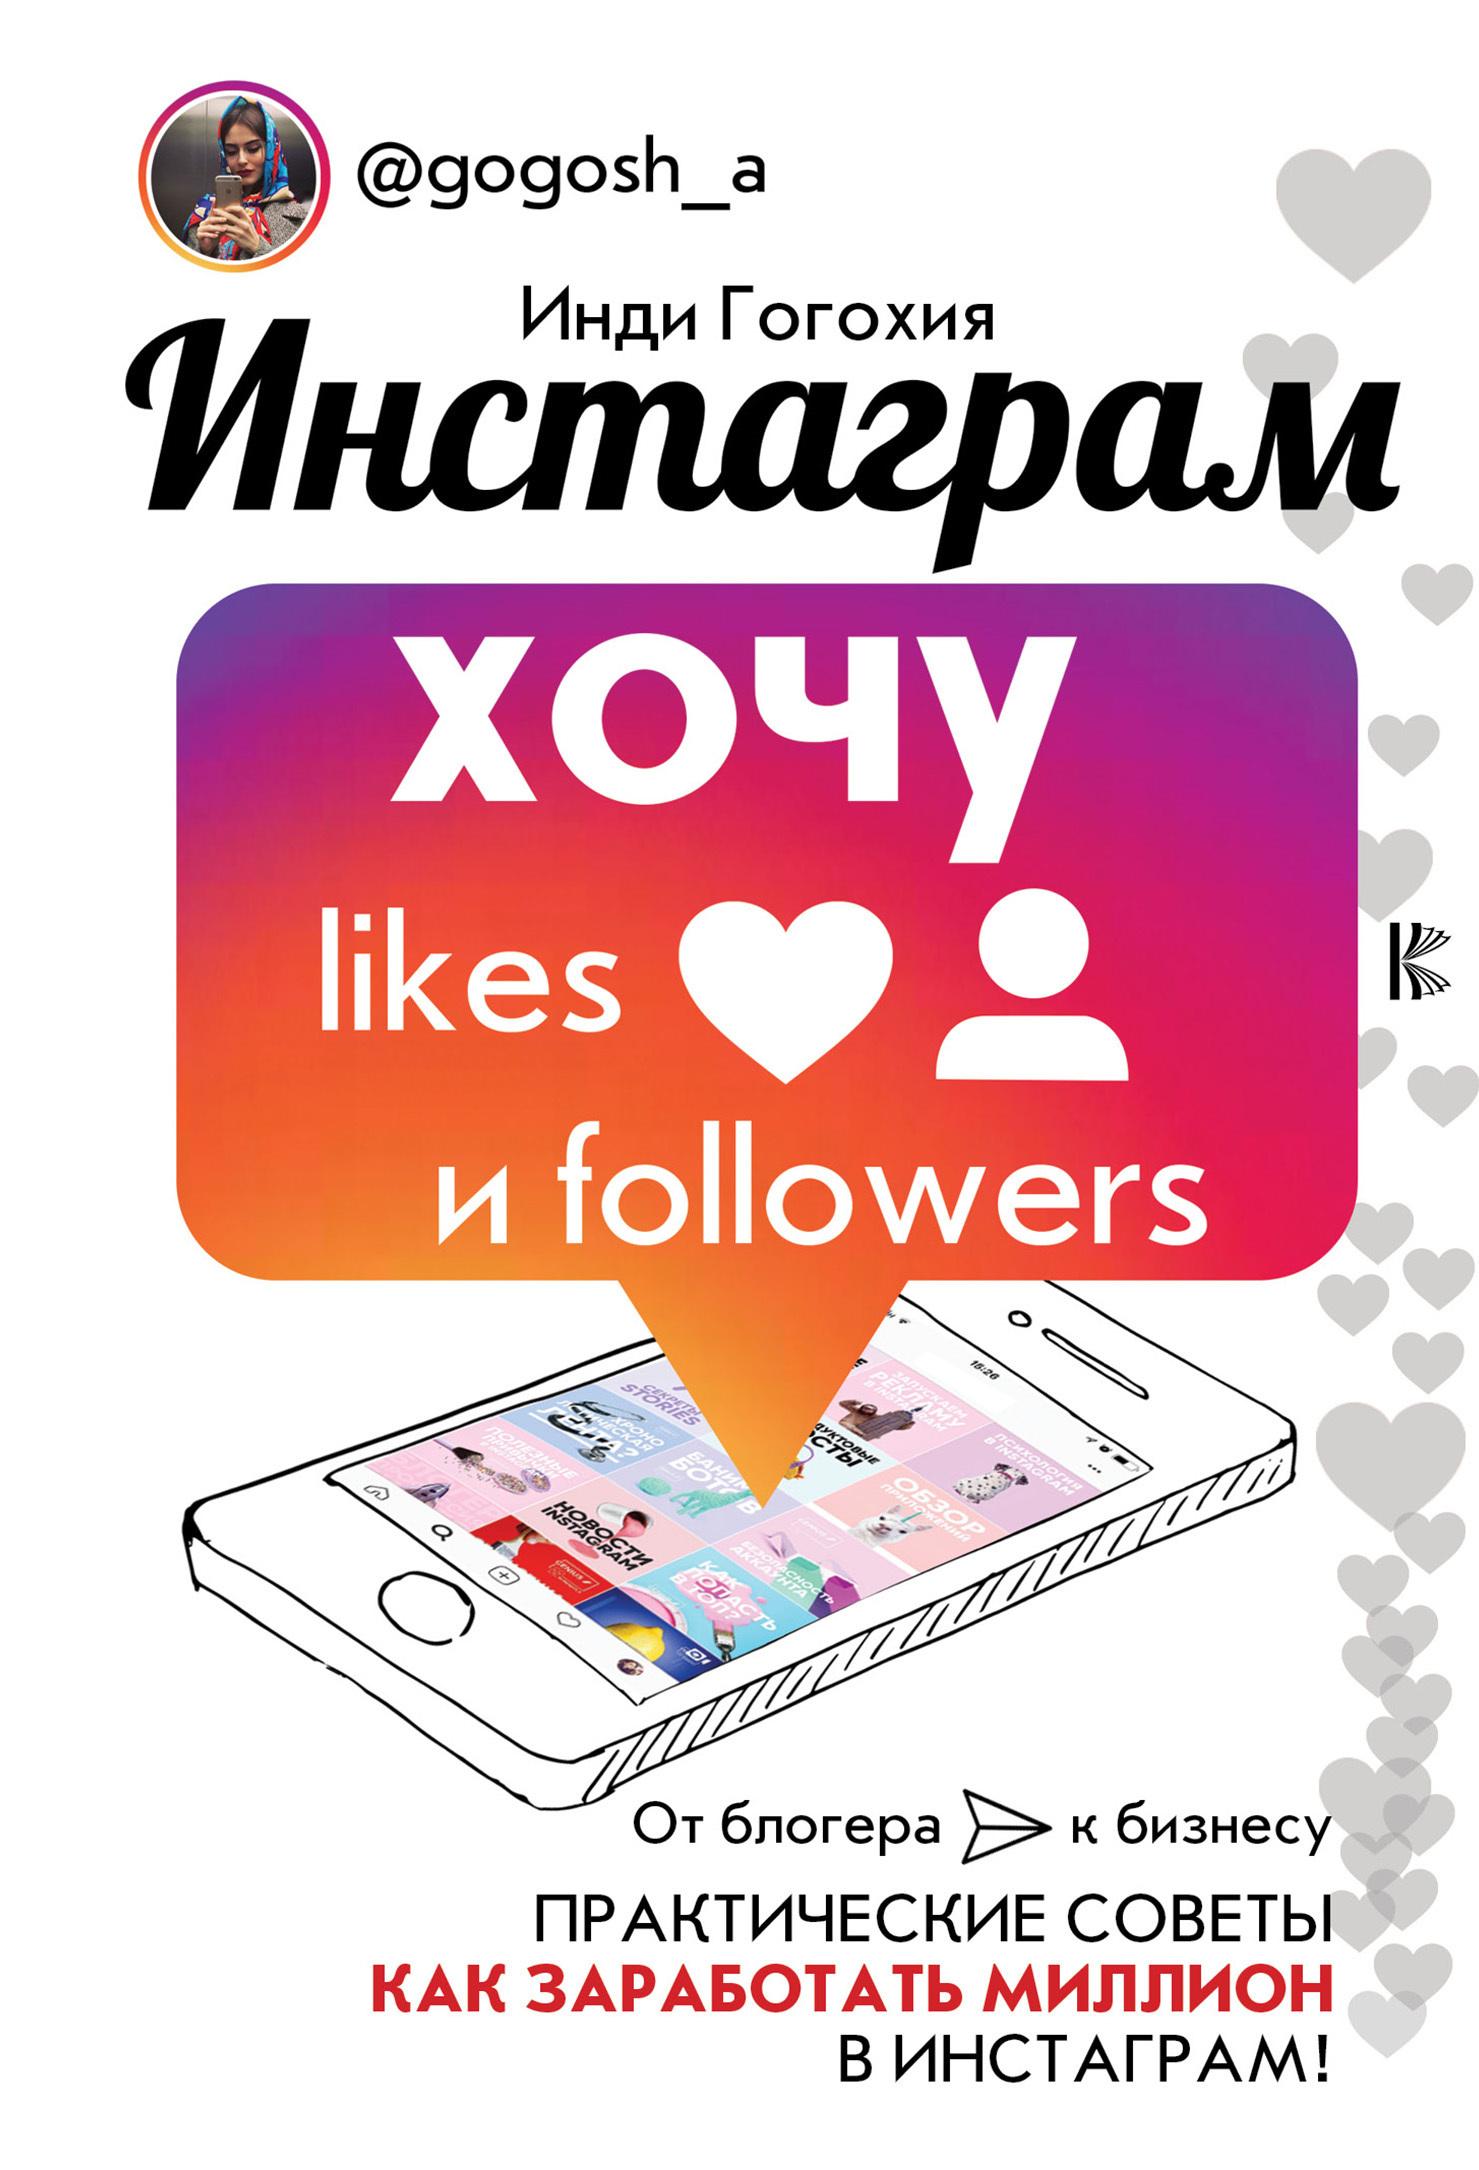 Инди Гогохия Инстаграм: хочу likes и followers дешевый